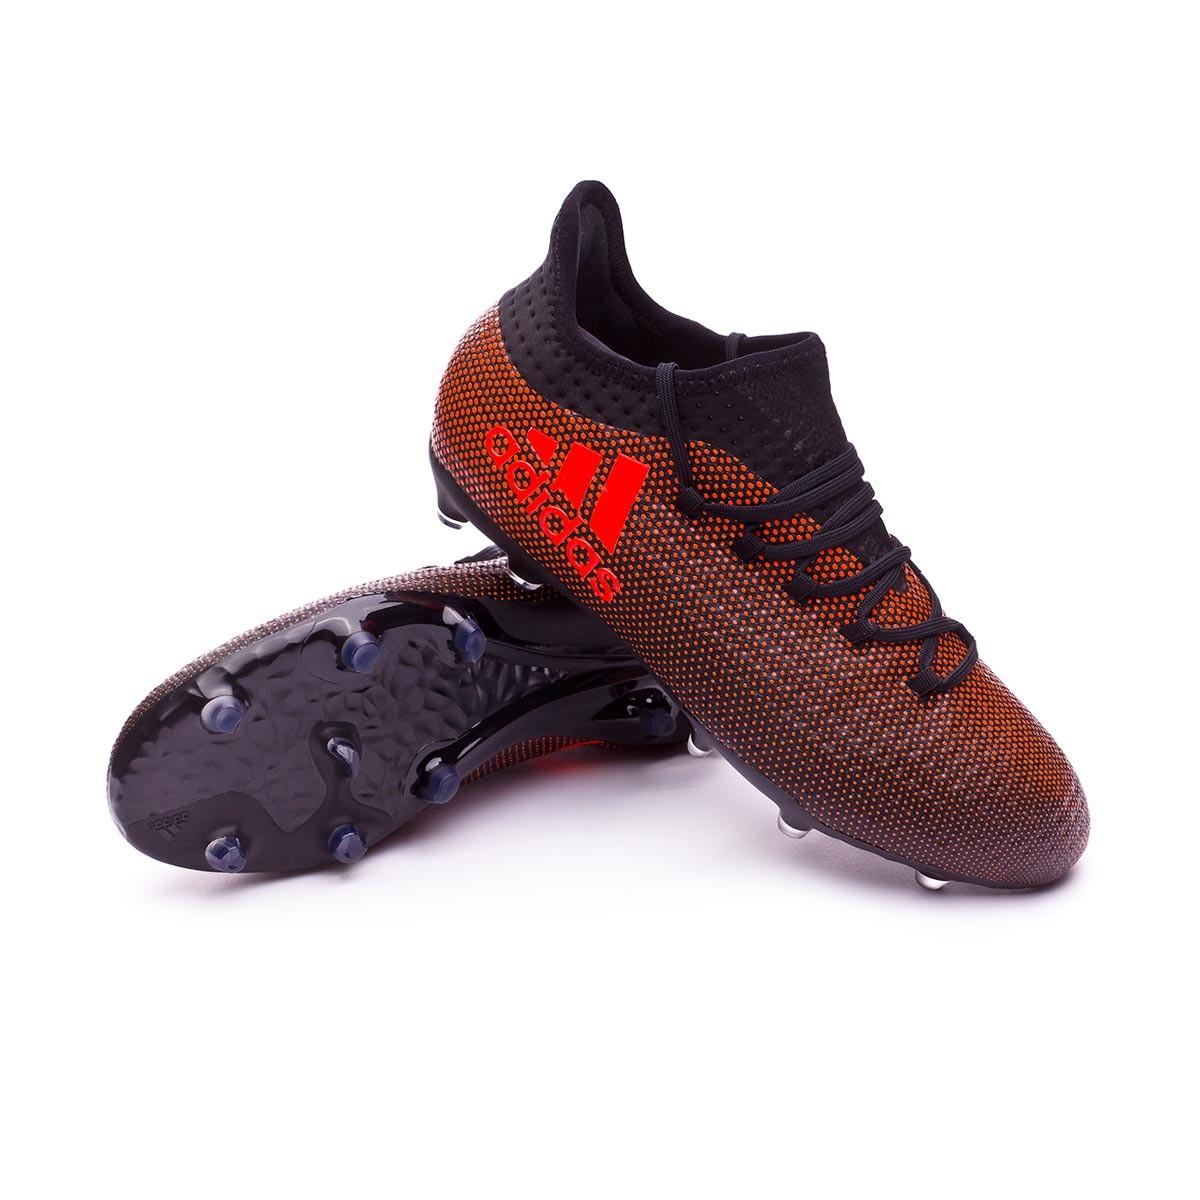 69366fed897 Football Boots adidas Kids X 17.1 FG Core black-Solar red-Solar ...